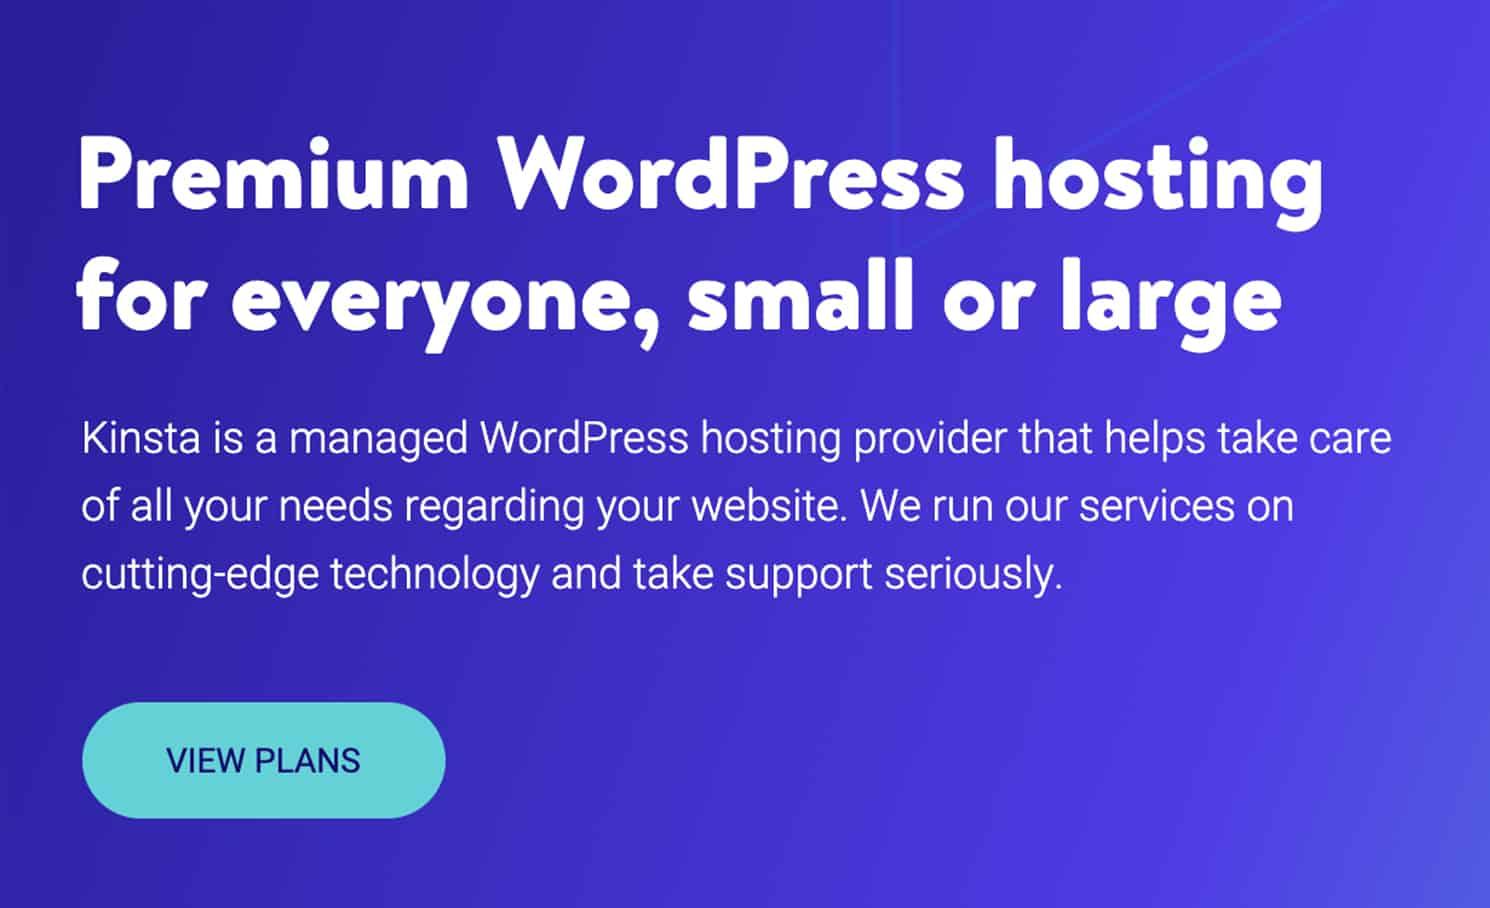 Kinsta, Premium WordPress Hosting